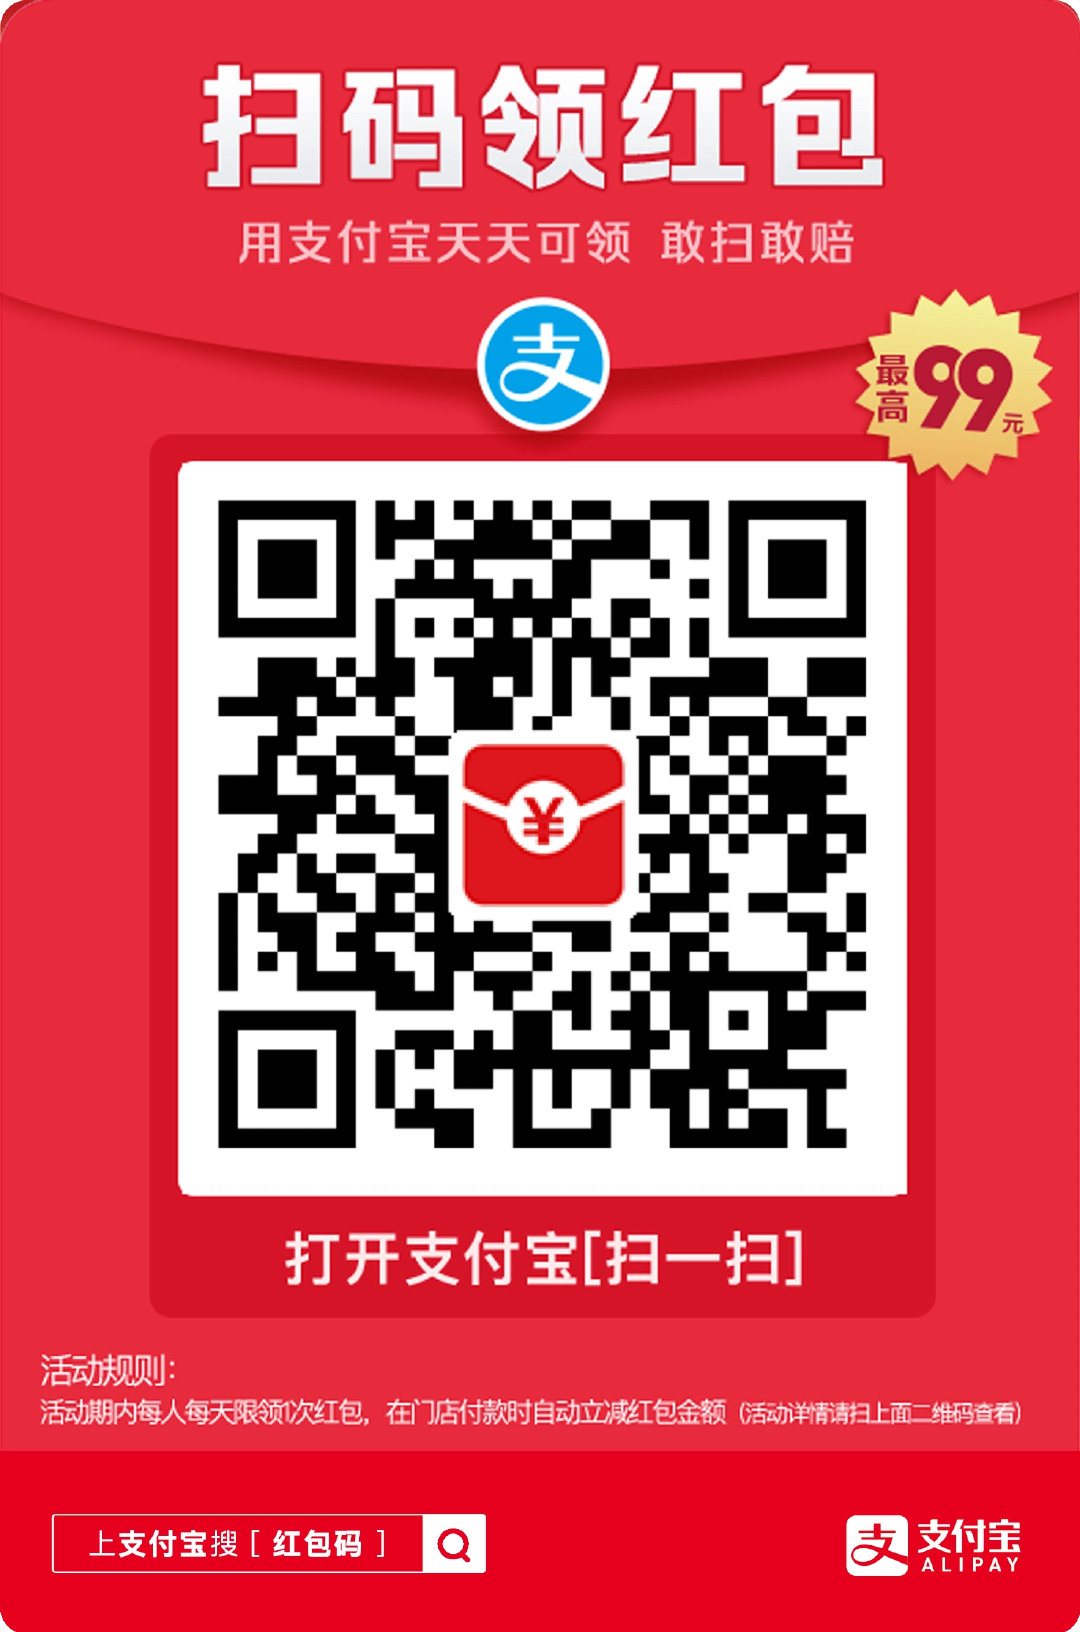 nurtori下载nur  wbr>tori  wbr>app安卓版下载_nur  wbr>app7.